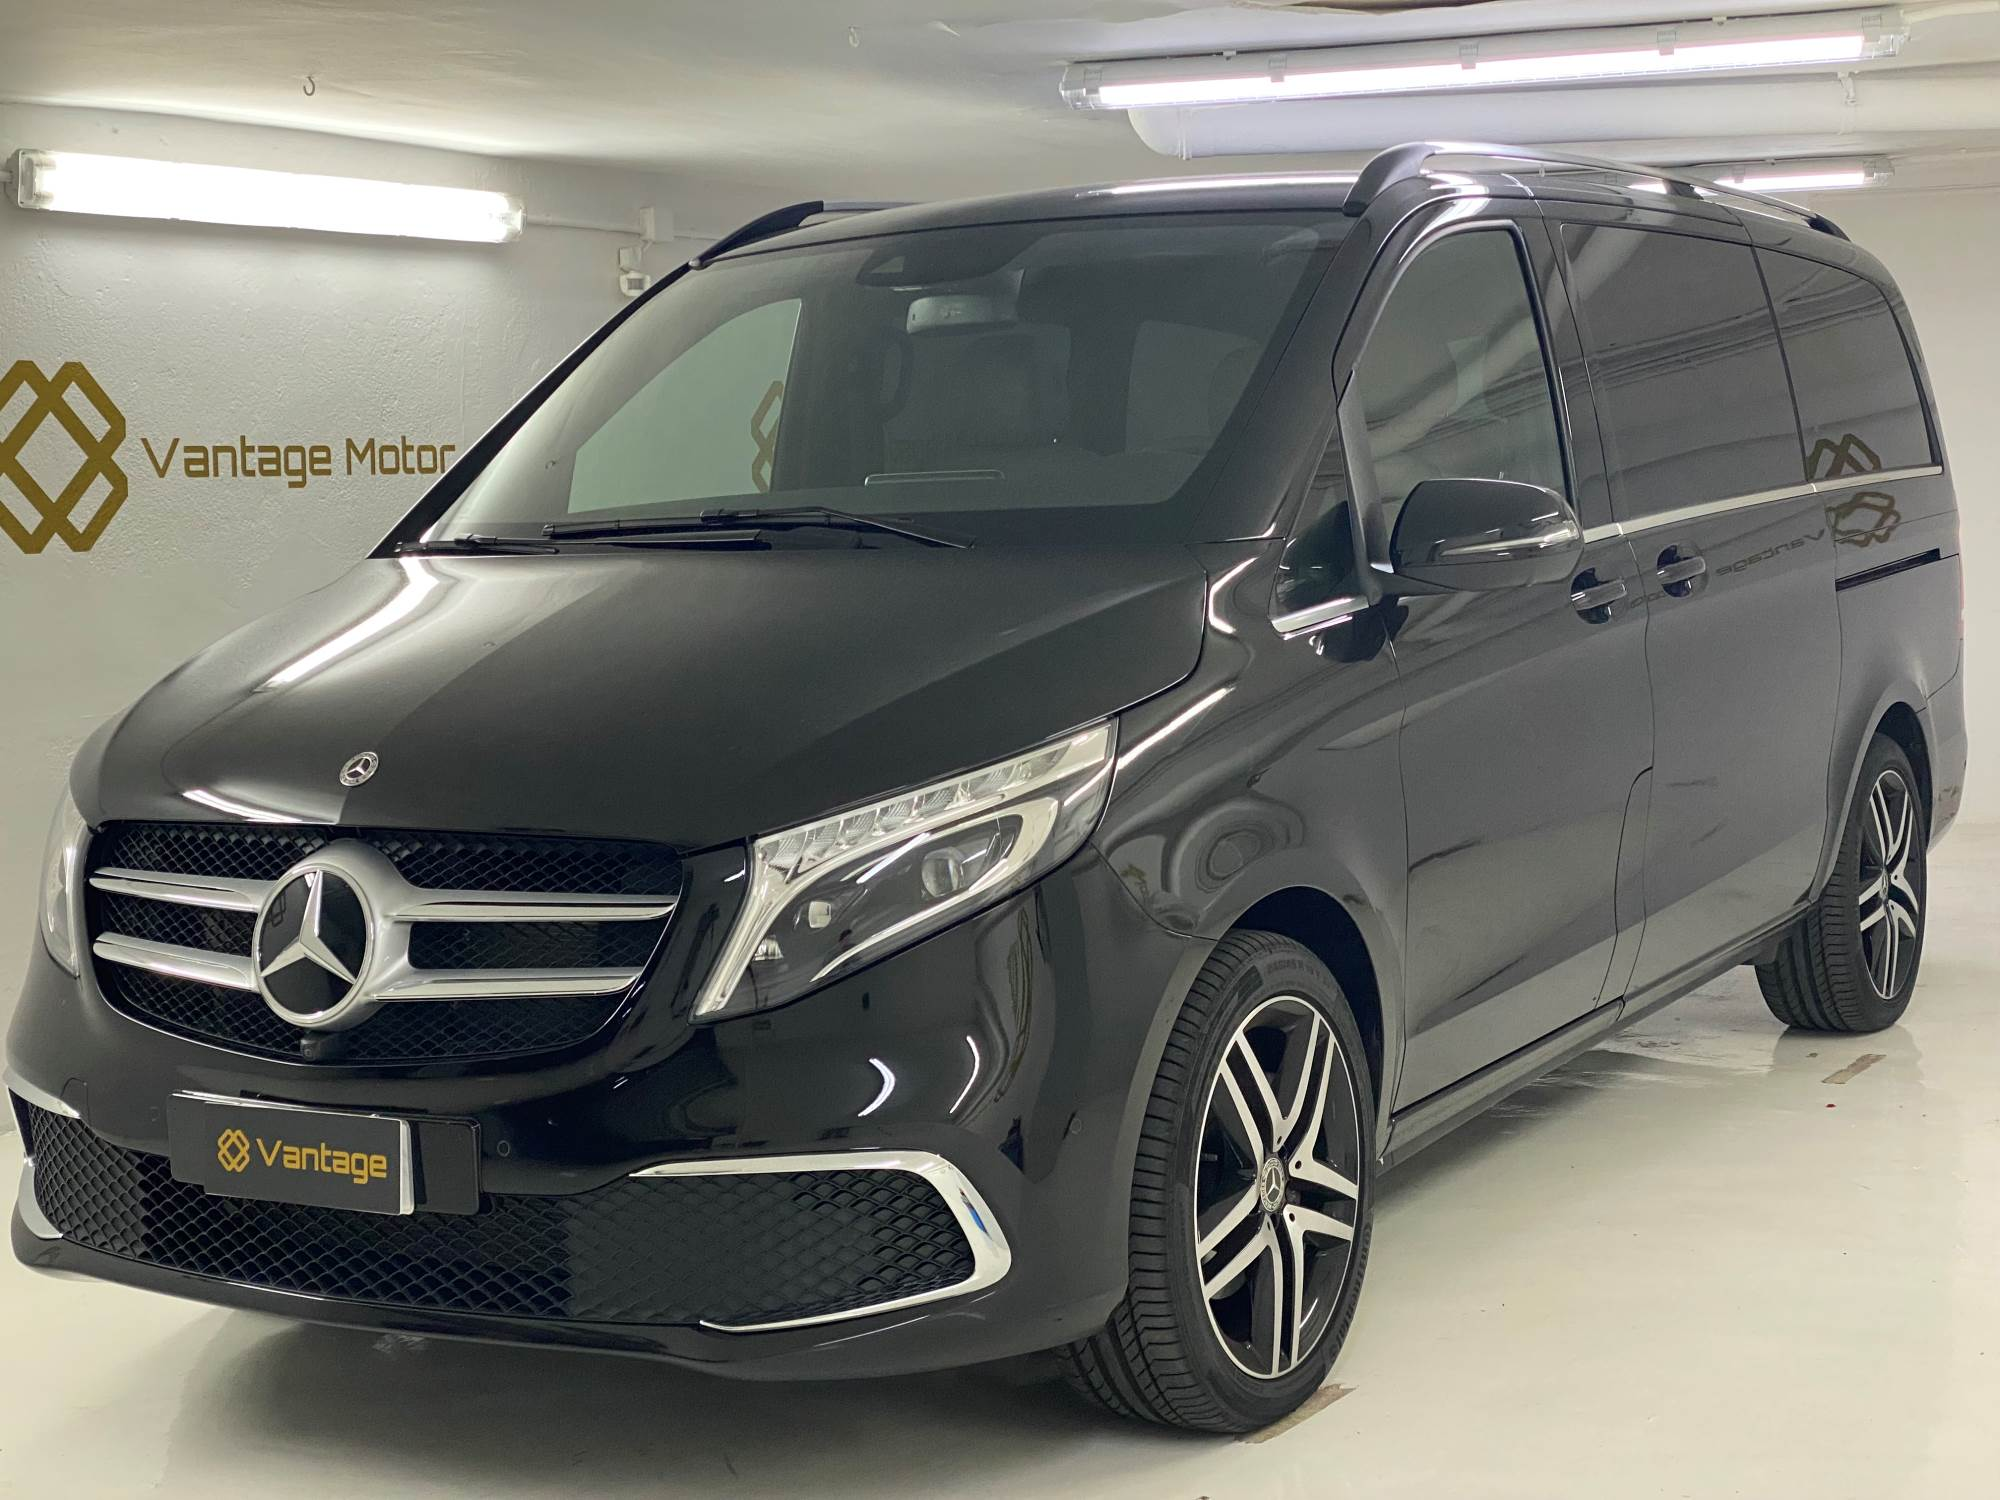 Mercedes-Benz - V 300 D 4MATIC LARGO  Dièsel  2020  4.700 Km